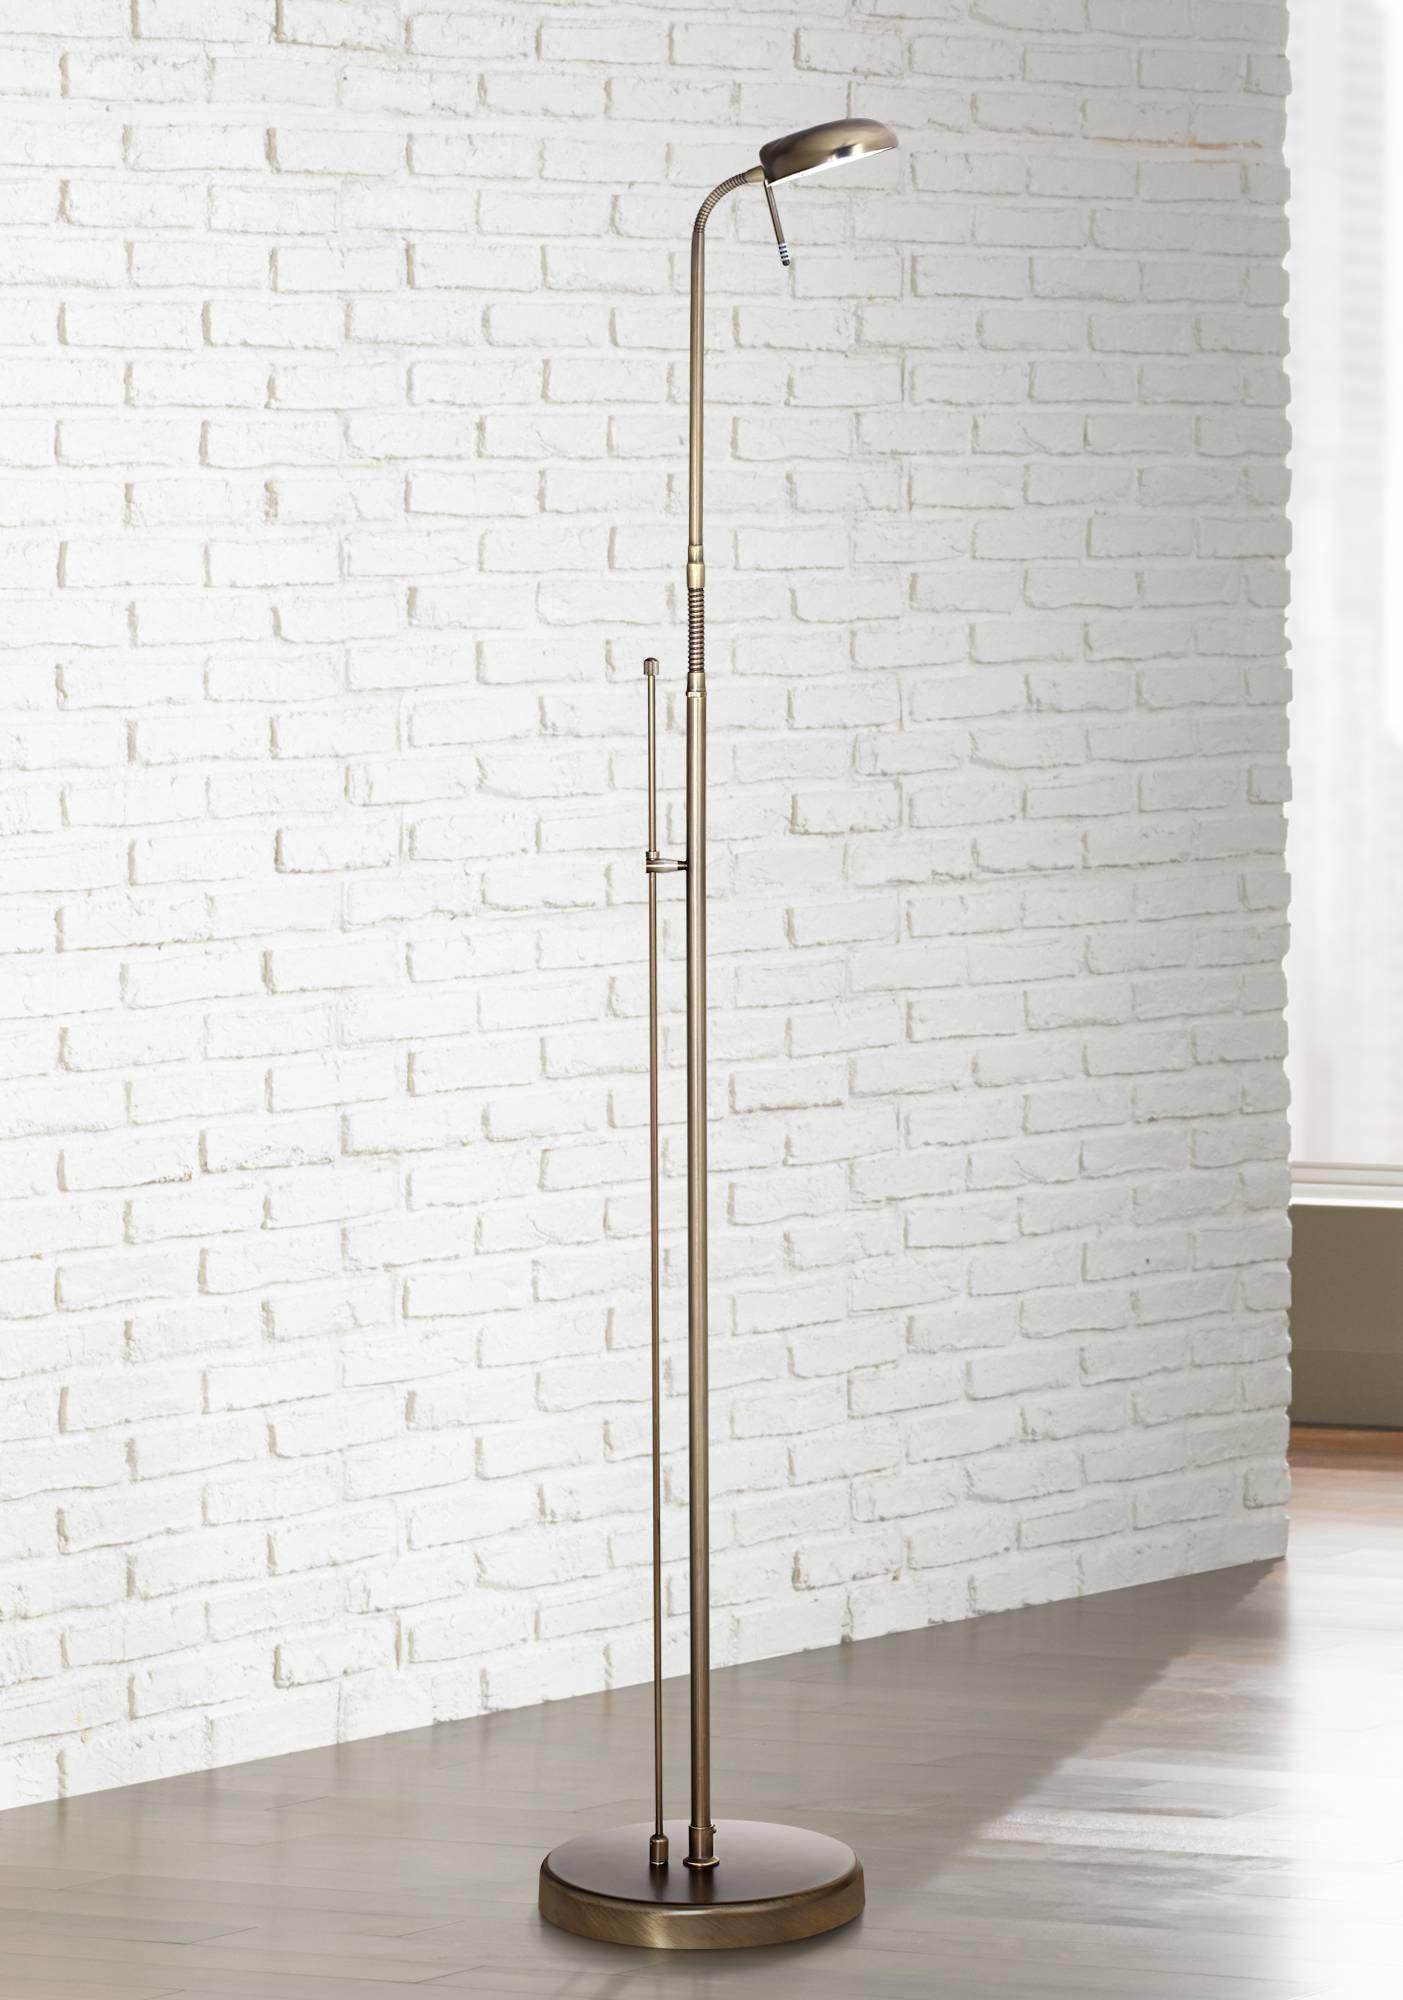 Regan Dark Brass LED Pharmacy Floor Lamp 5R555 Lamps